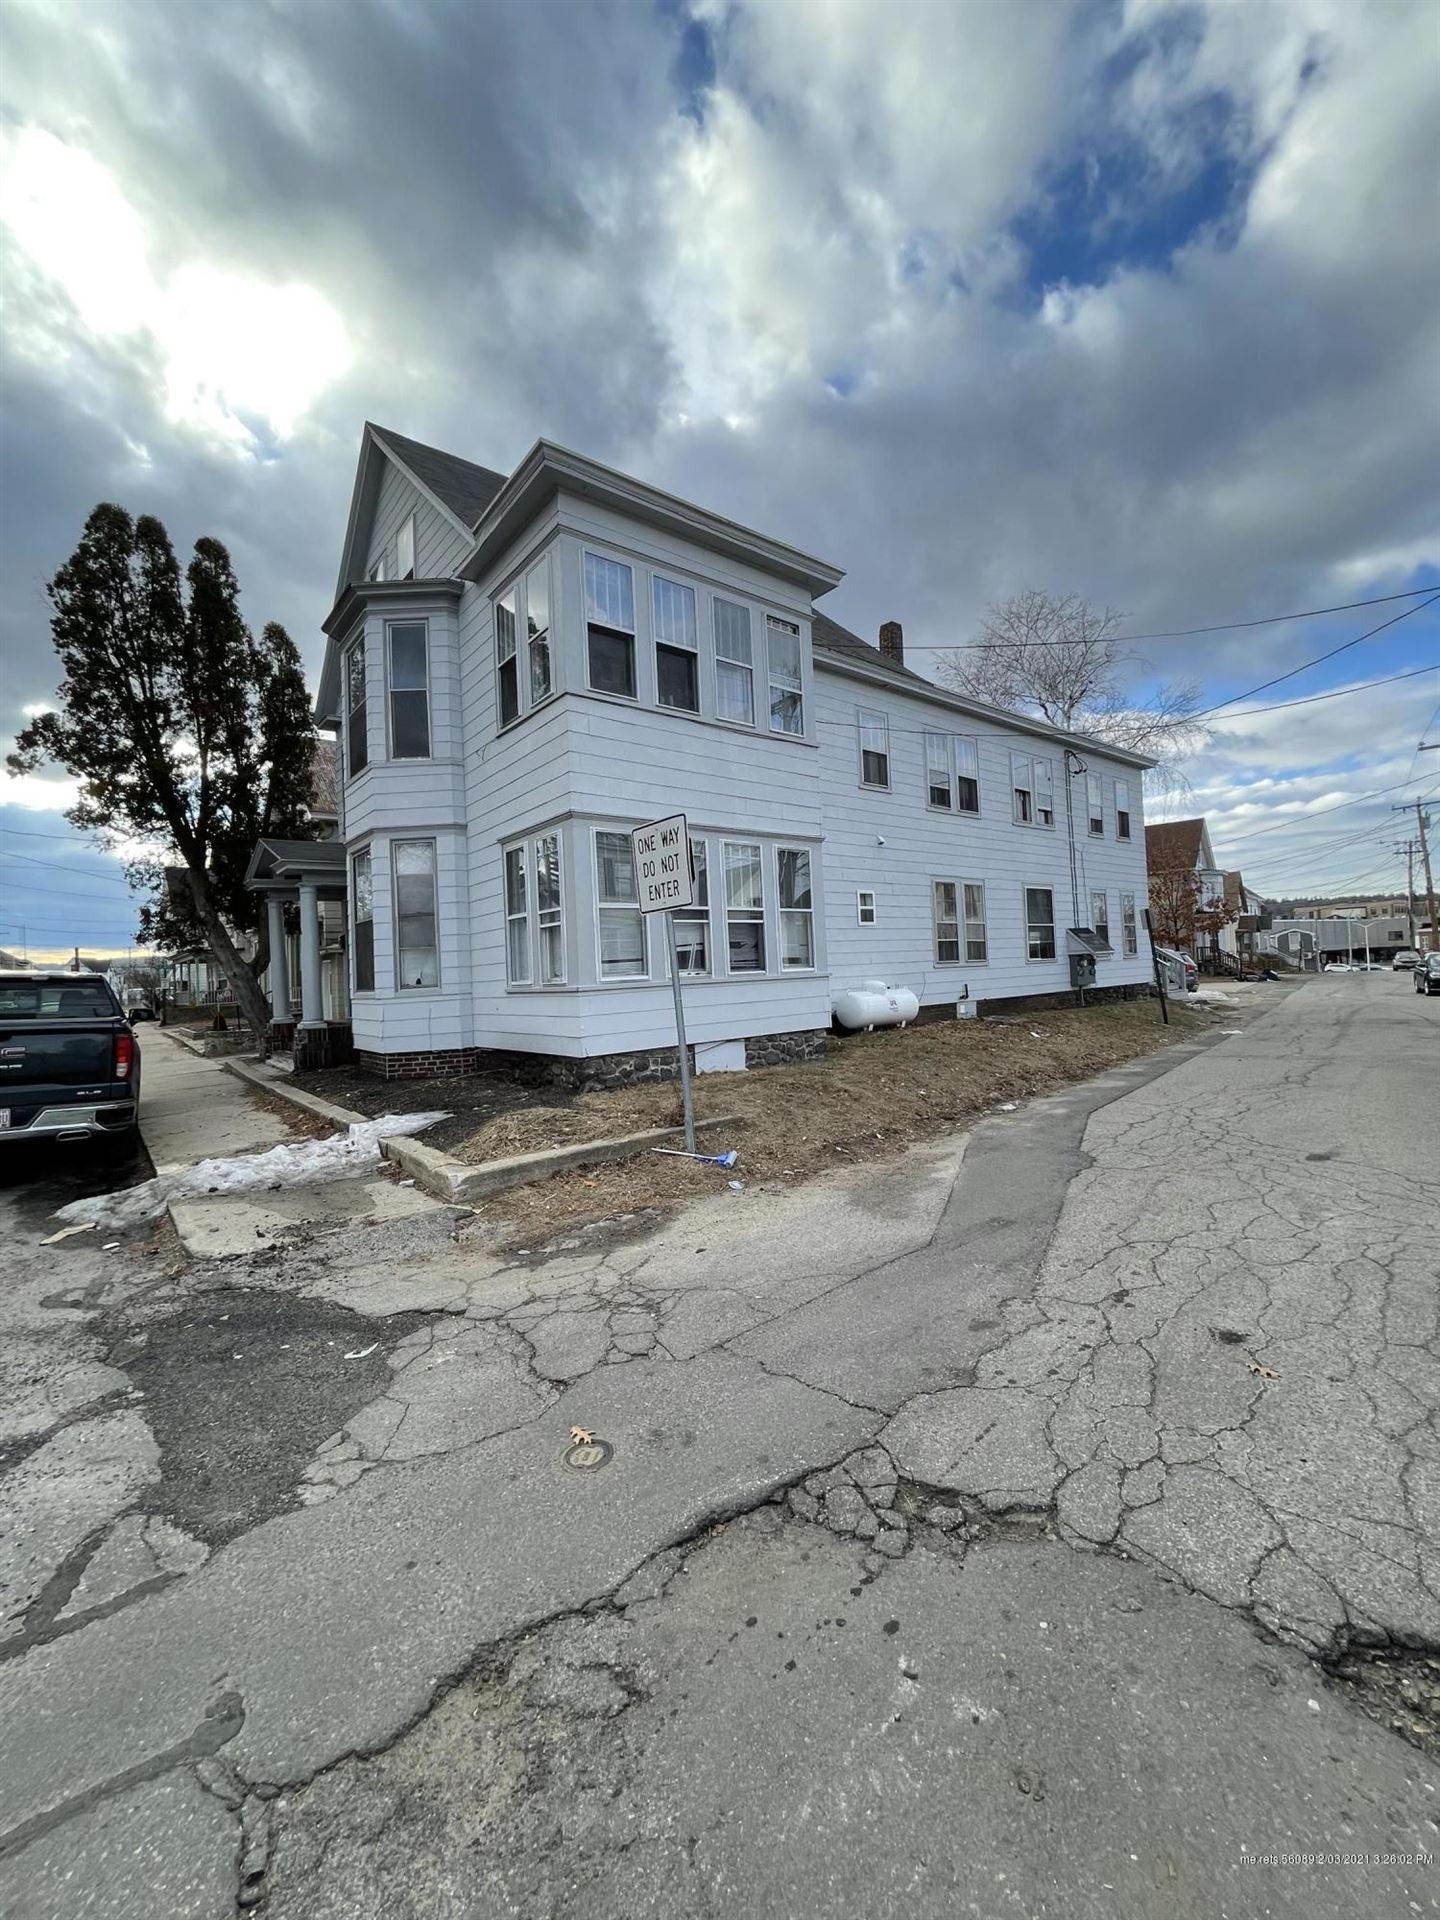 Photo of 16 Bodwell Street, Sanford, ME 04073 (MLS # 1480545)